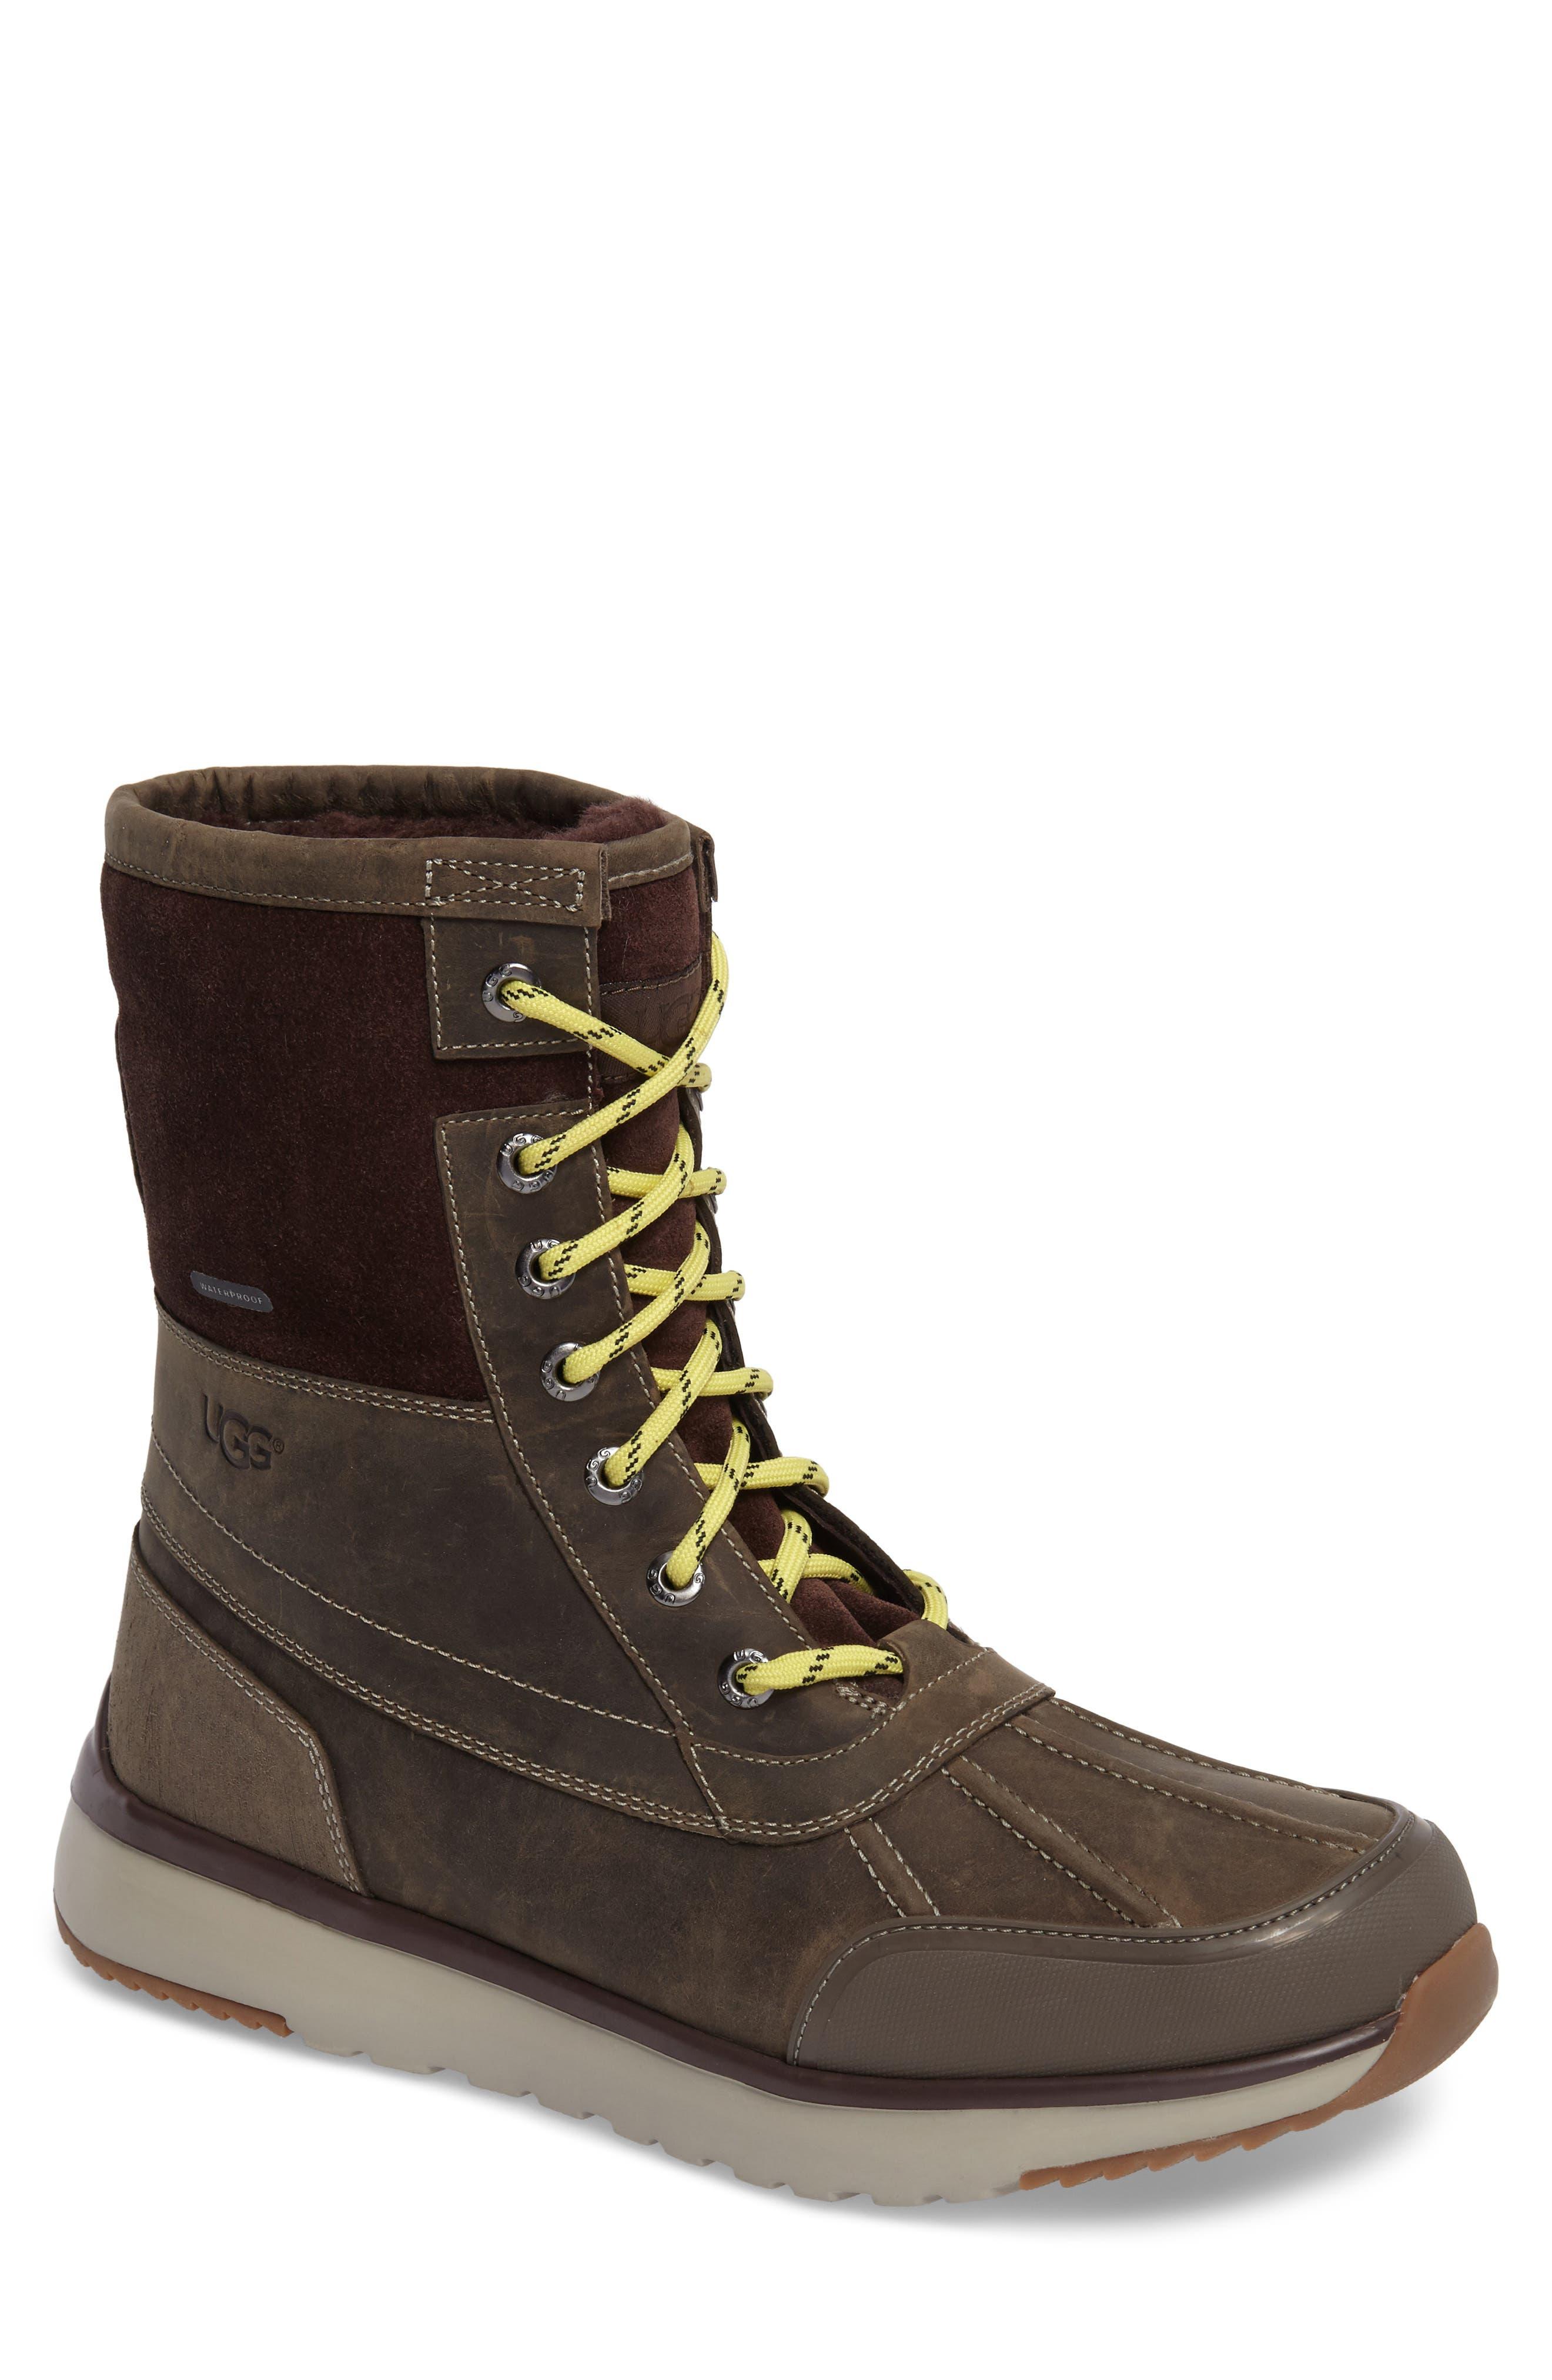 Ugg Eliasson Waterproof Snow Boot, Grey